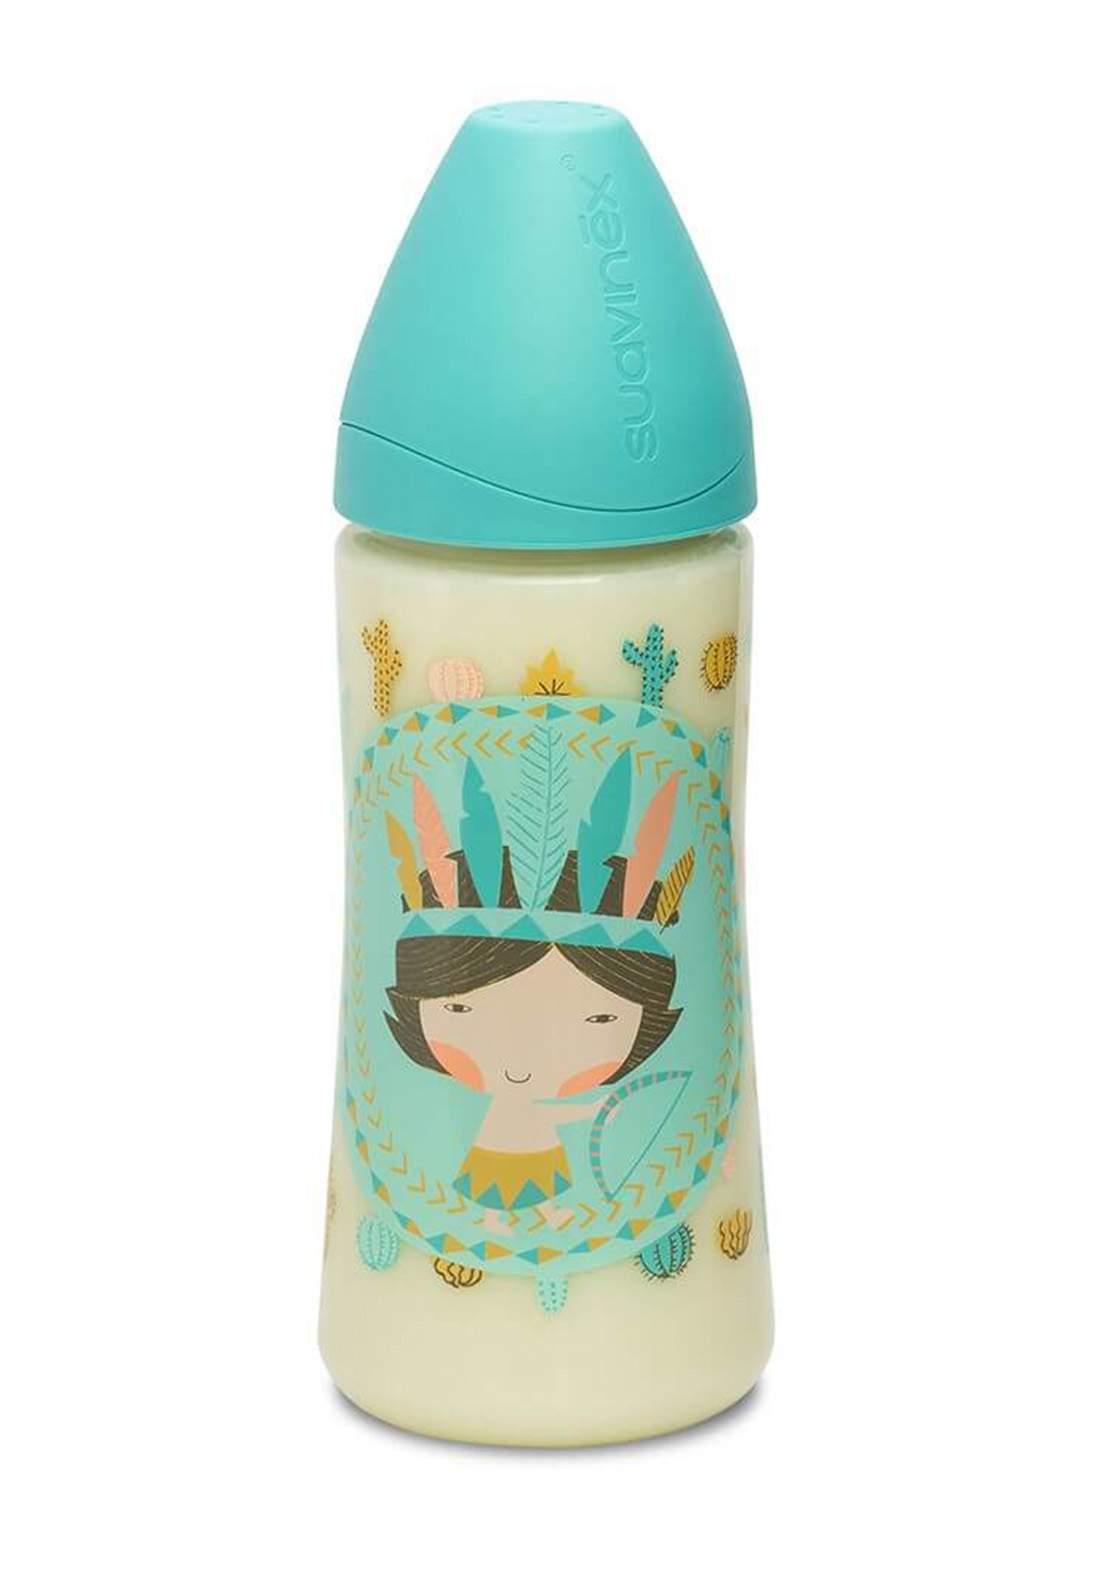 Suavinex Physiological Feeding Bottle 270 ml  رضاعة اطفال